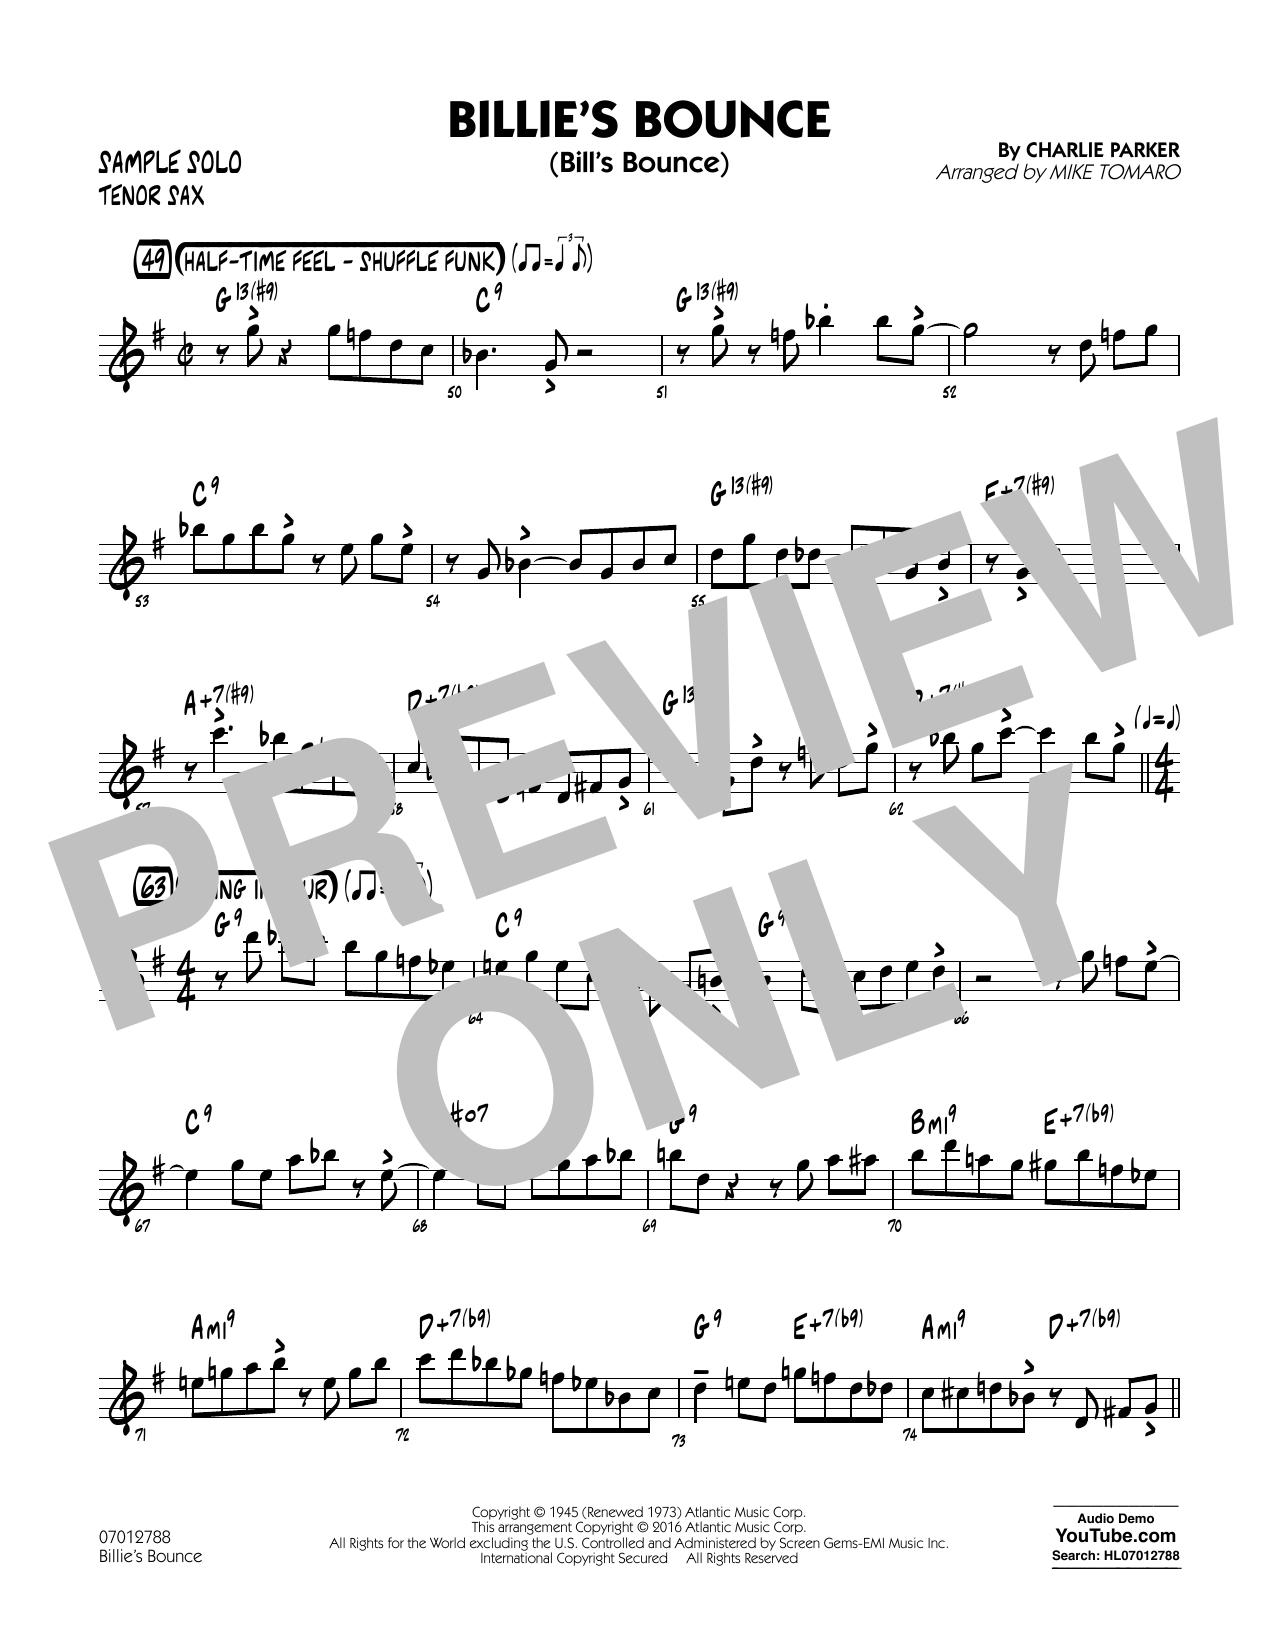 Billie's Bounce - Tenor Sax Sample Solo (Jazz Ensemble)